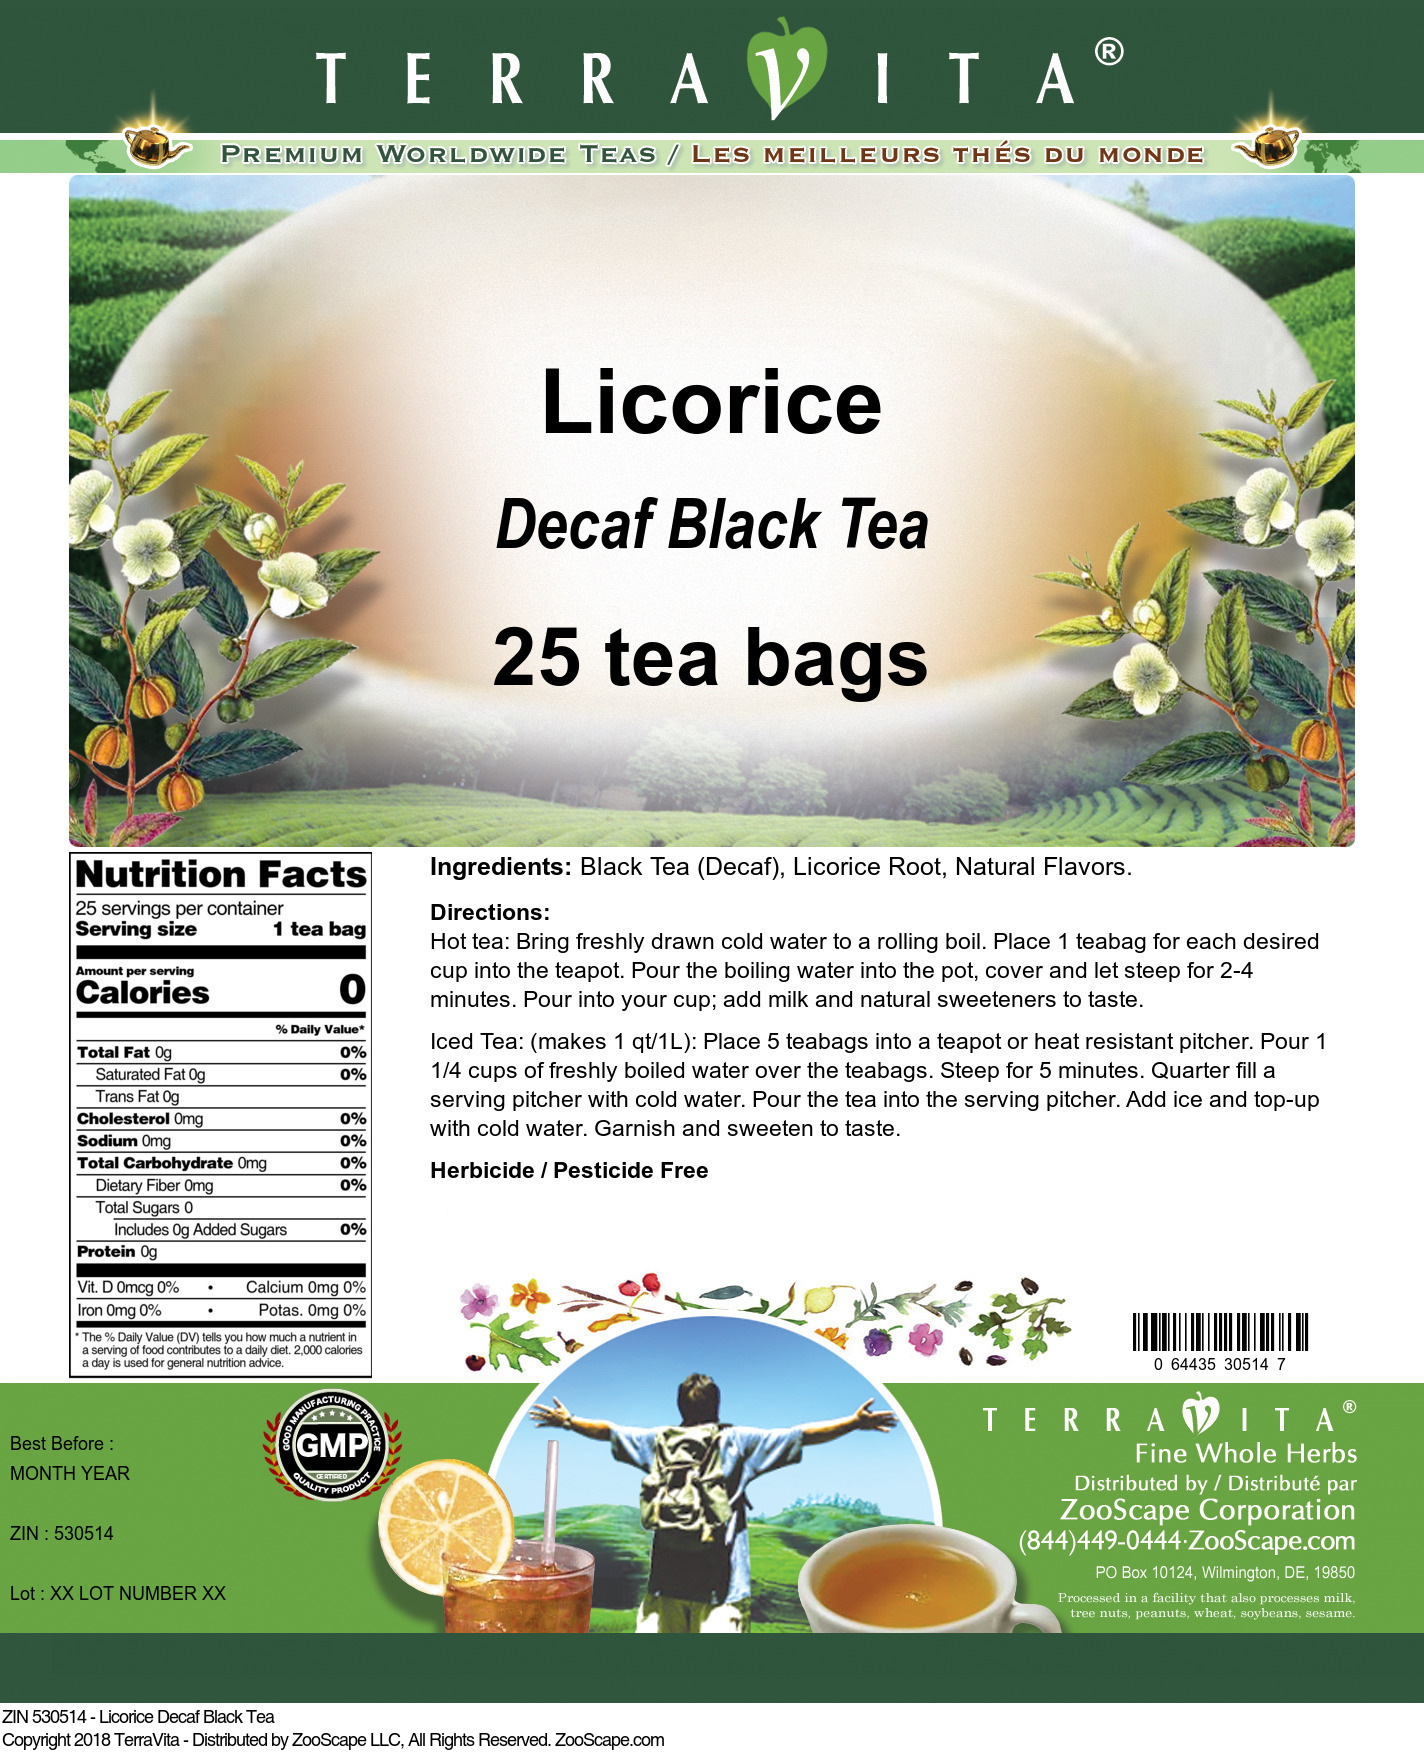 Licorice Decaf Black Tea